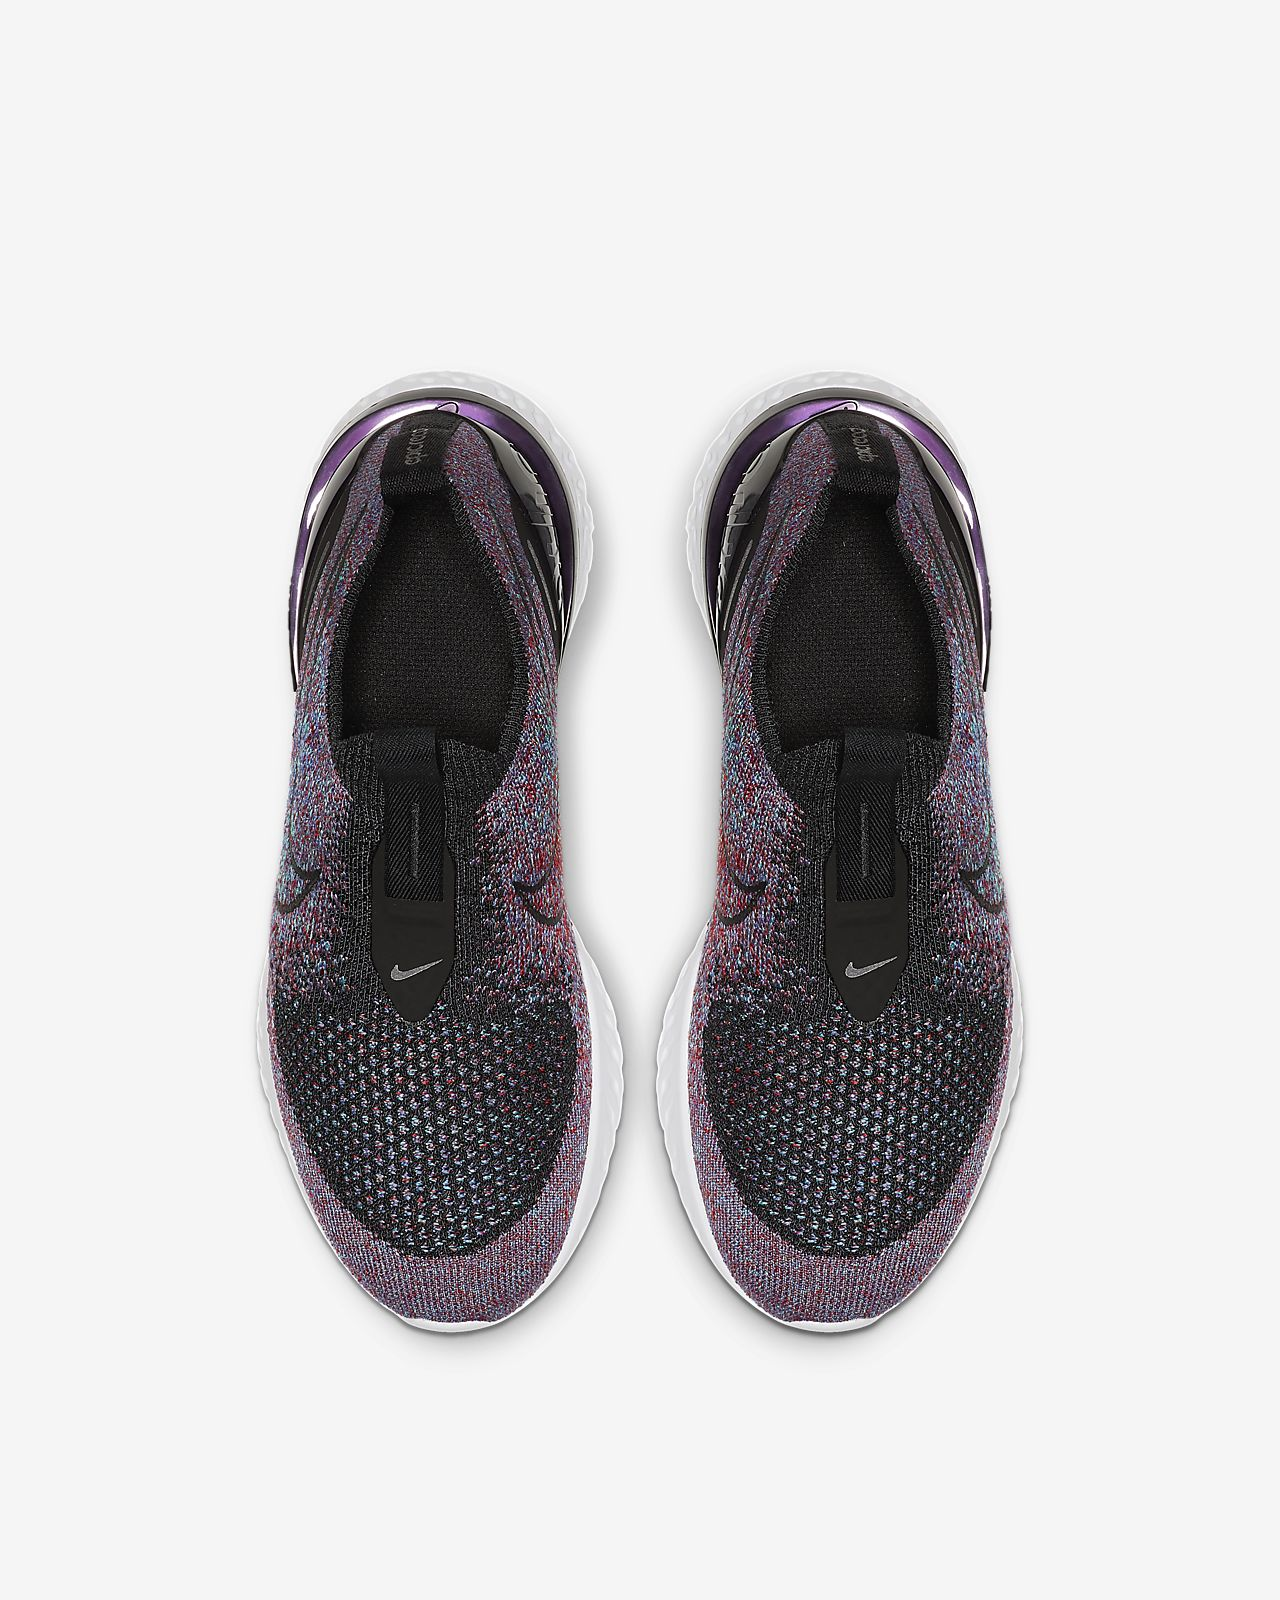 3eb64e7e1e8 Nike Epic React Flyknit Older Kids  Running Shoe. Nike.com SG